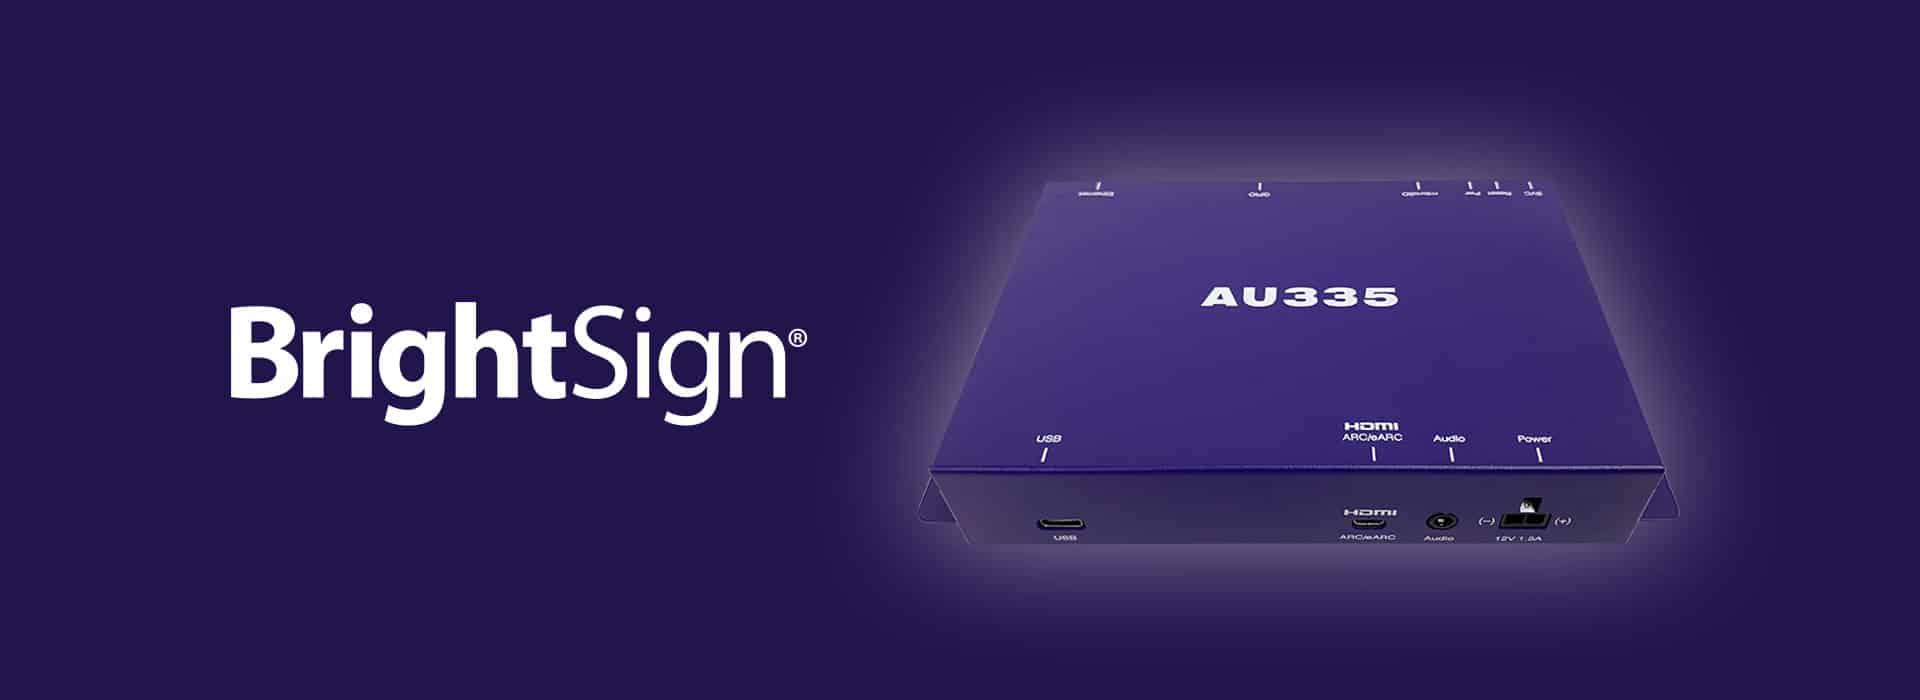 BrightSign AU335 Audio Player